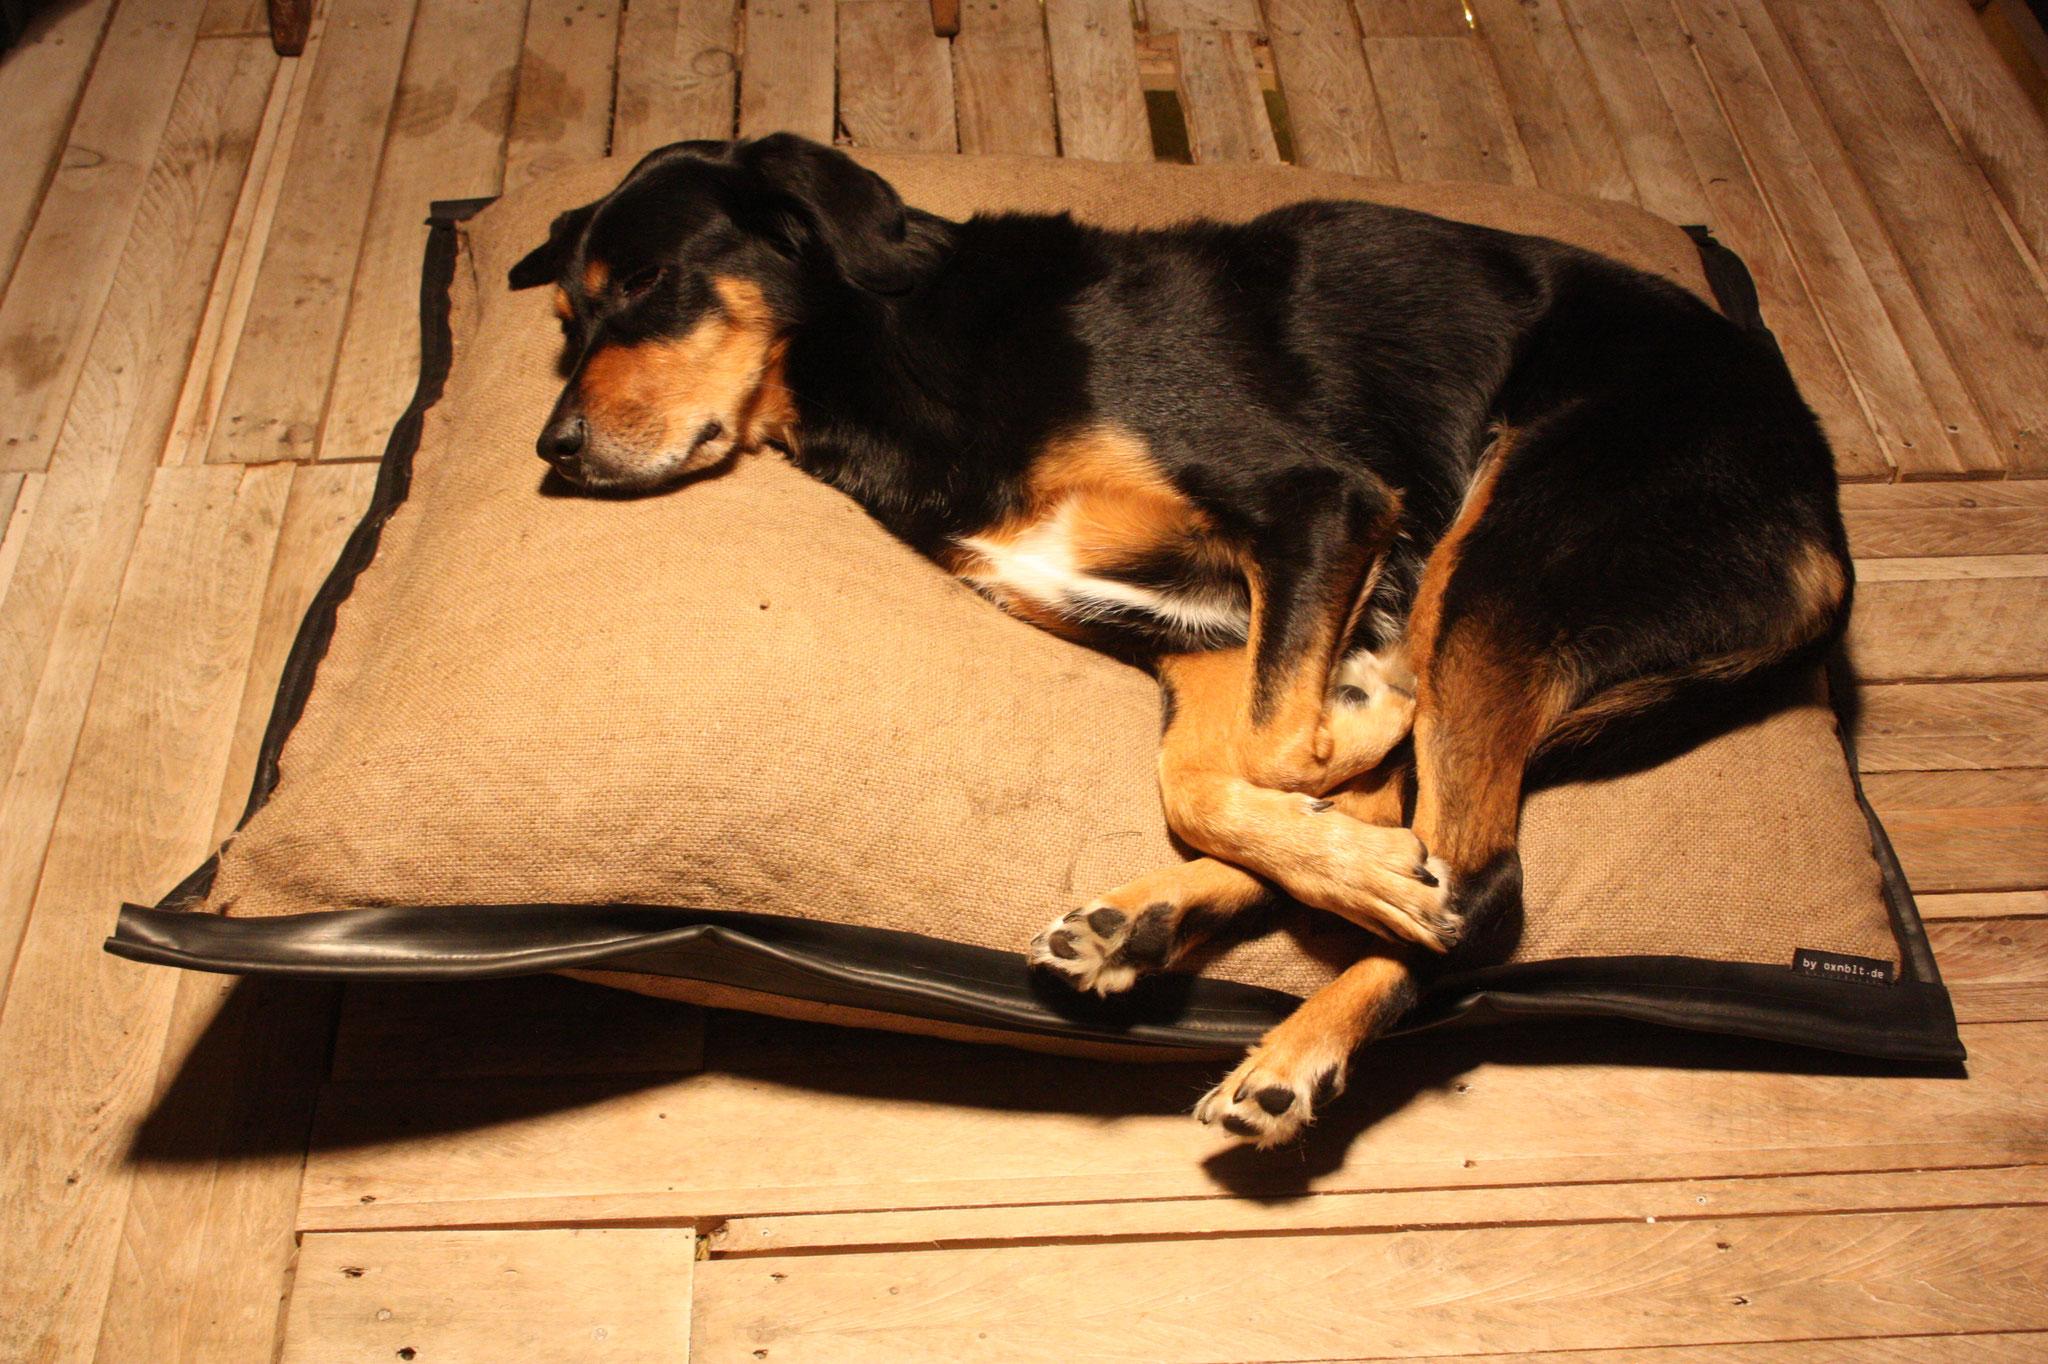 Upcycling: Hundekissen aus Jutesäcken und Fahrradschlauch